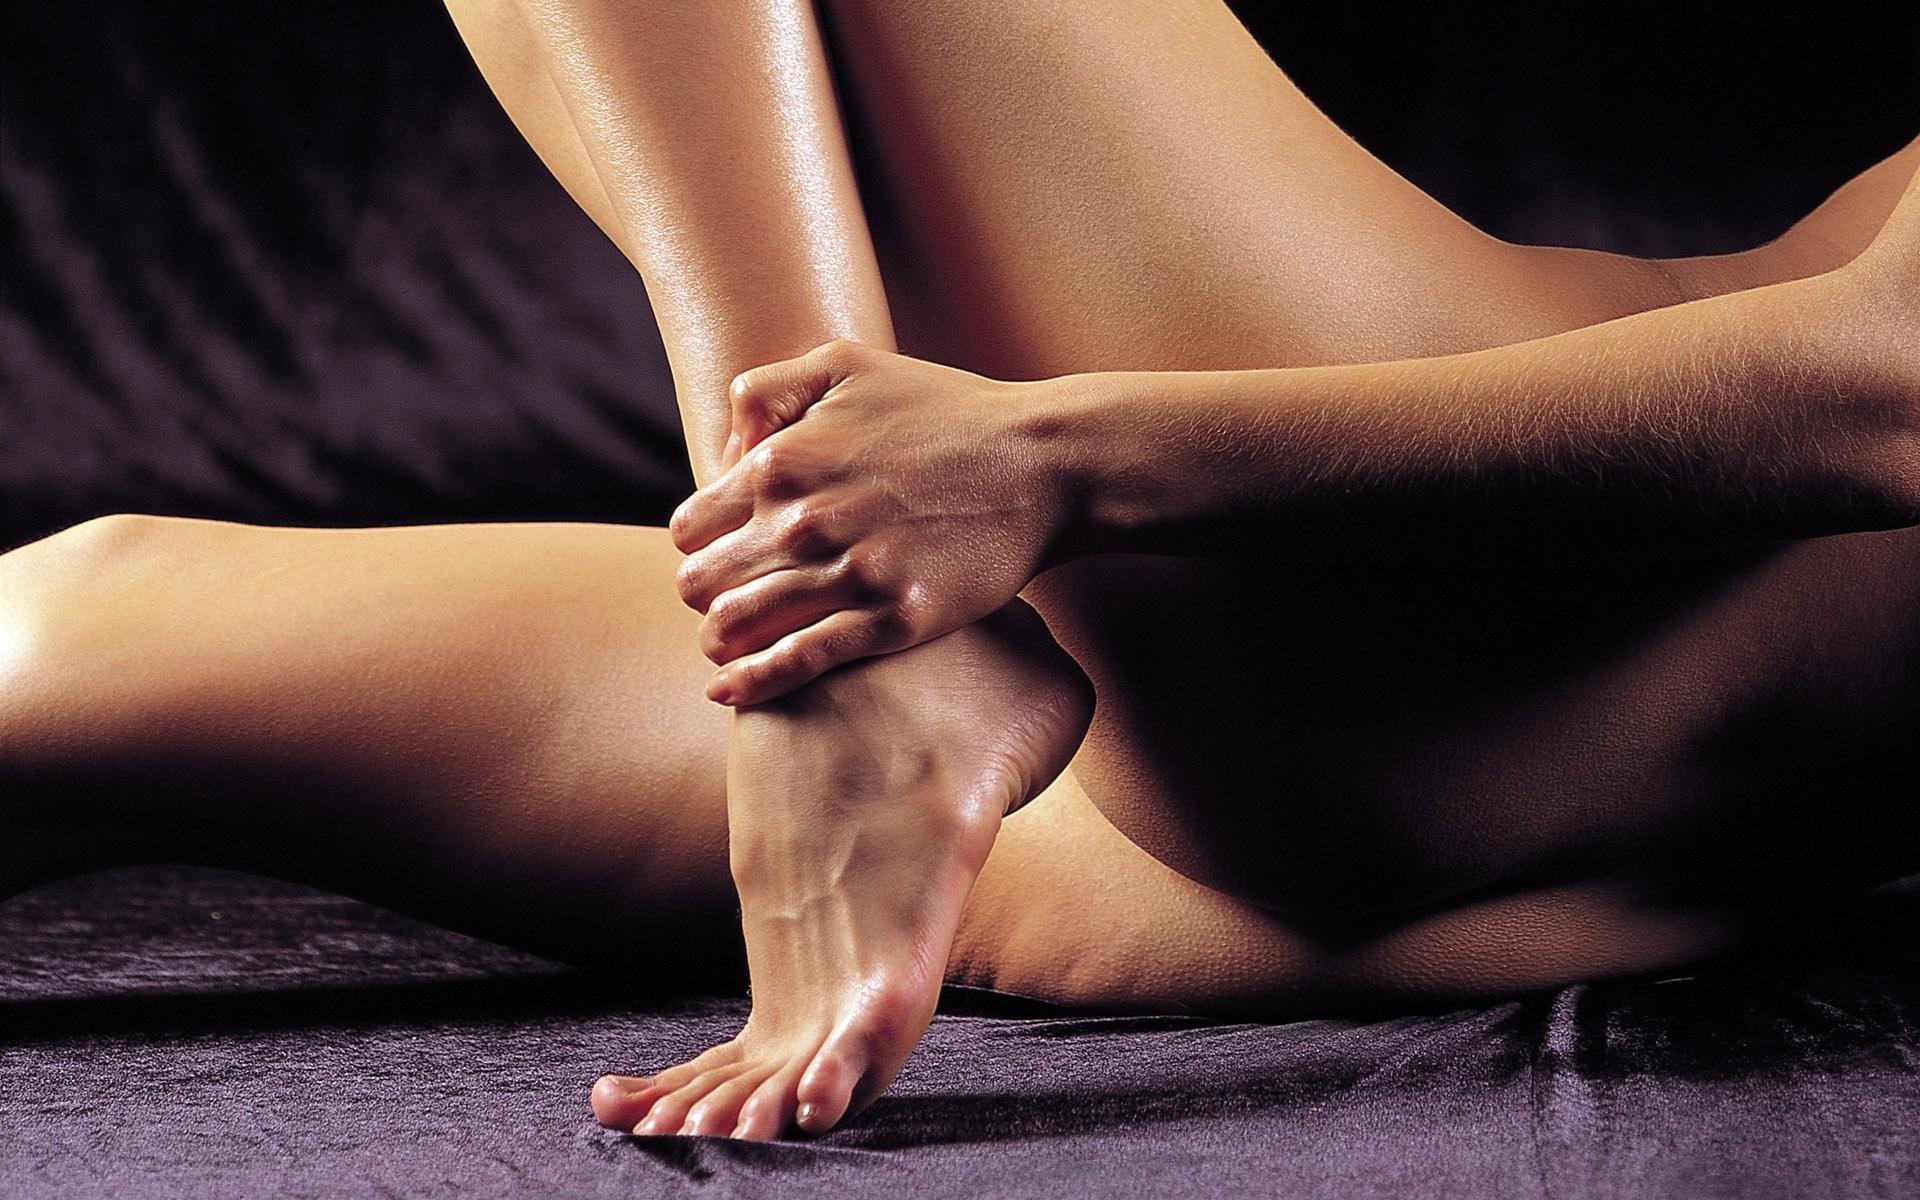 foto-krasivie-eroticheskie-nogi